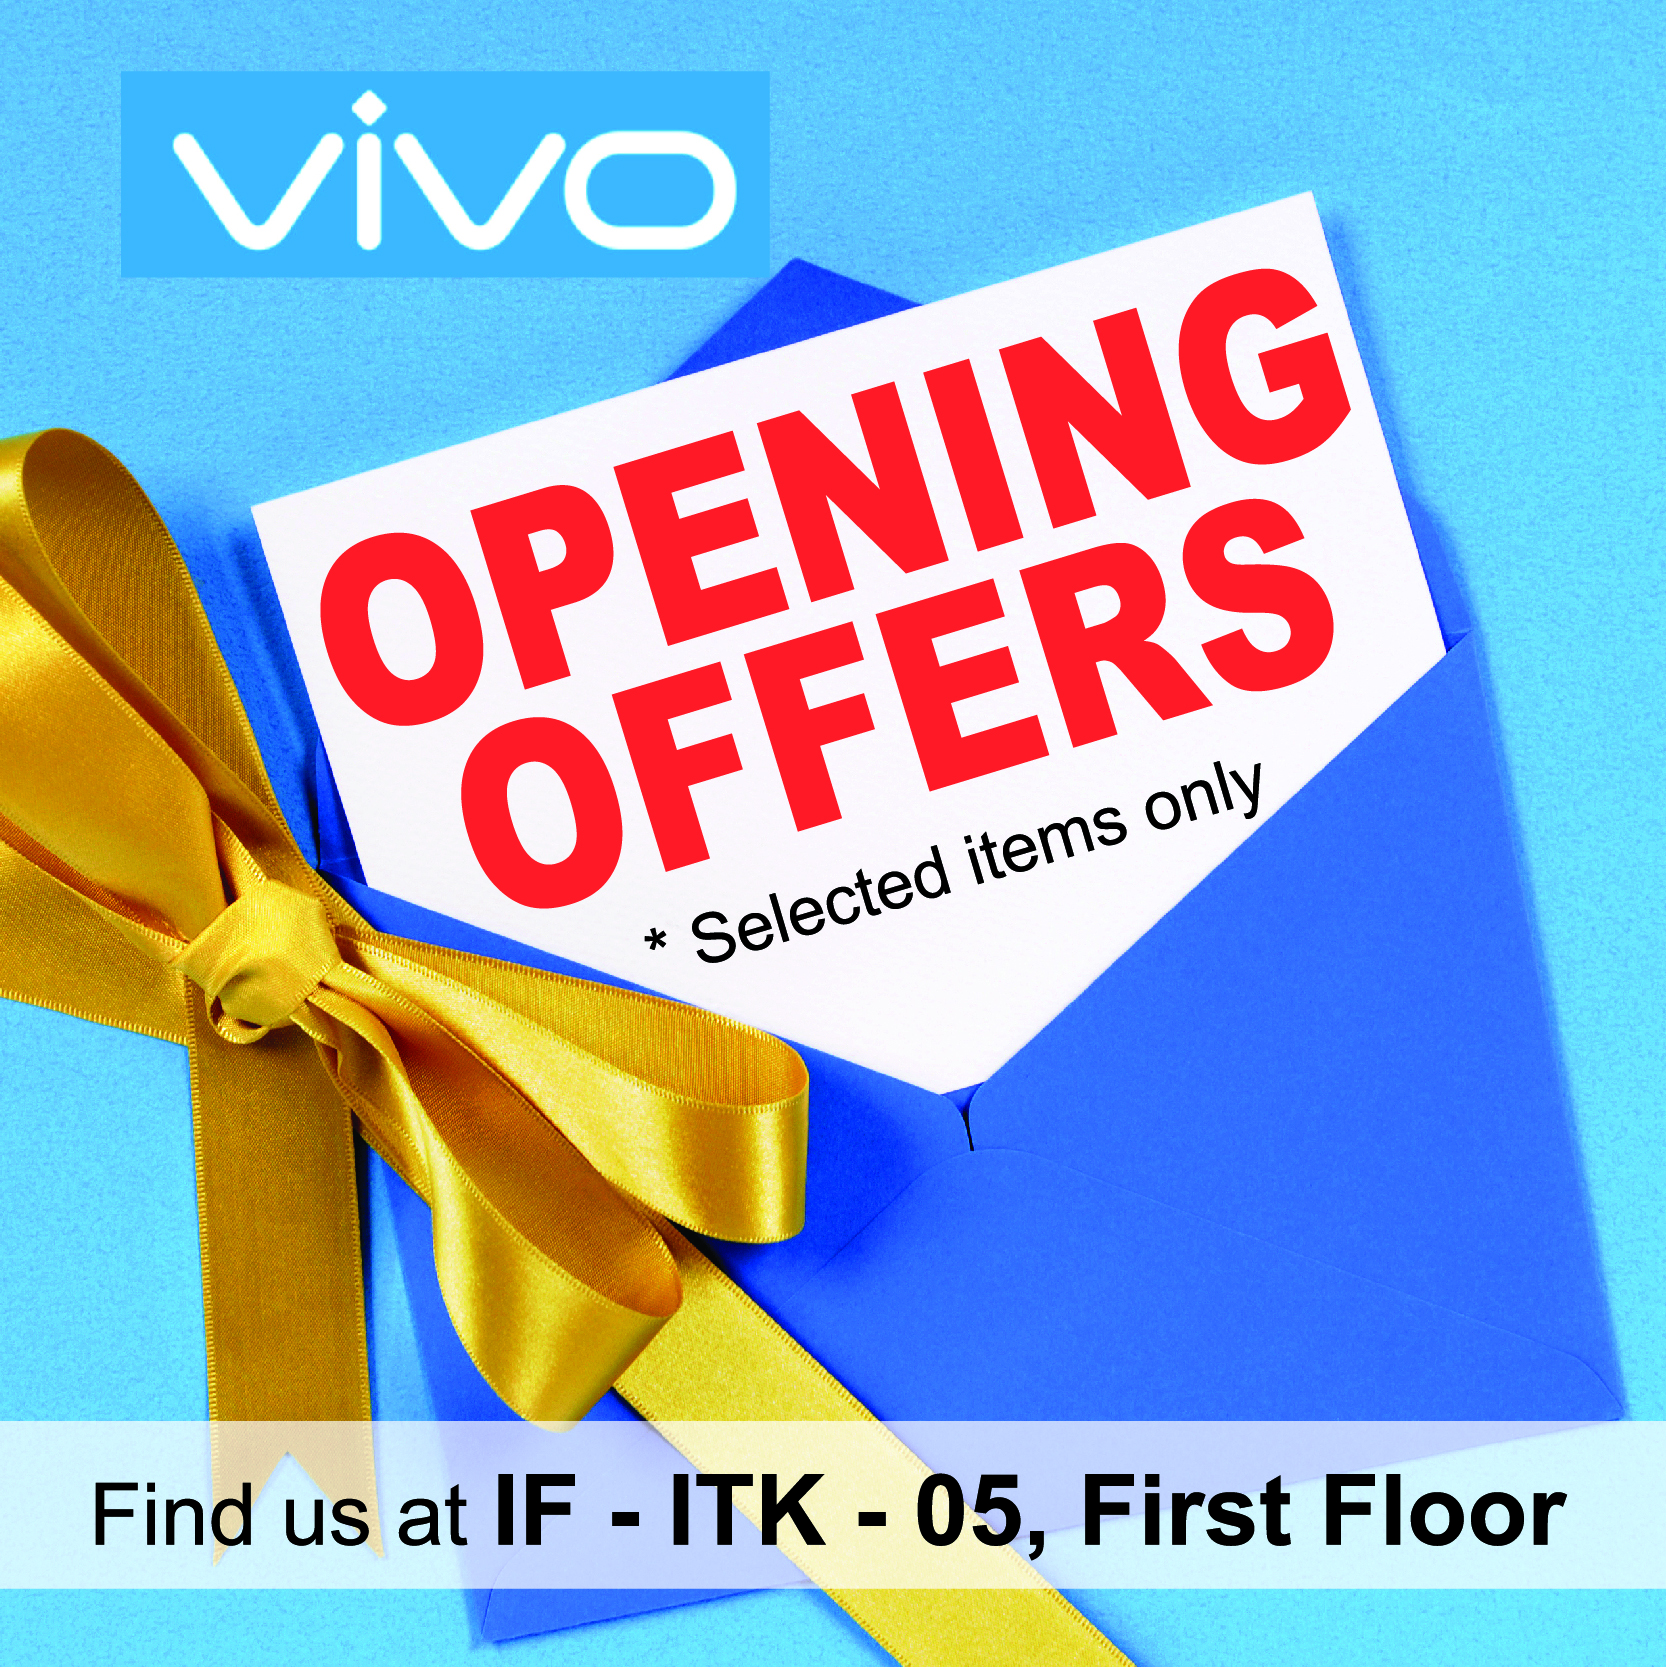 VIVO New Opening